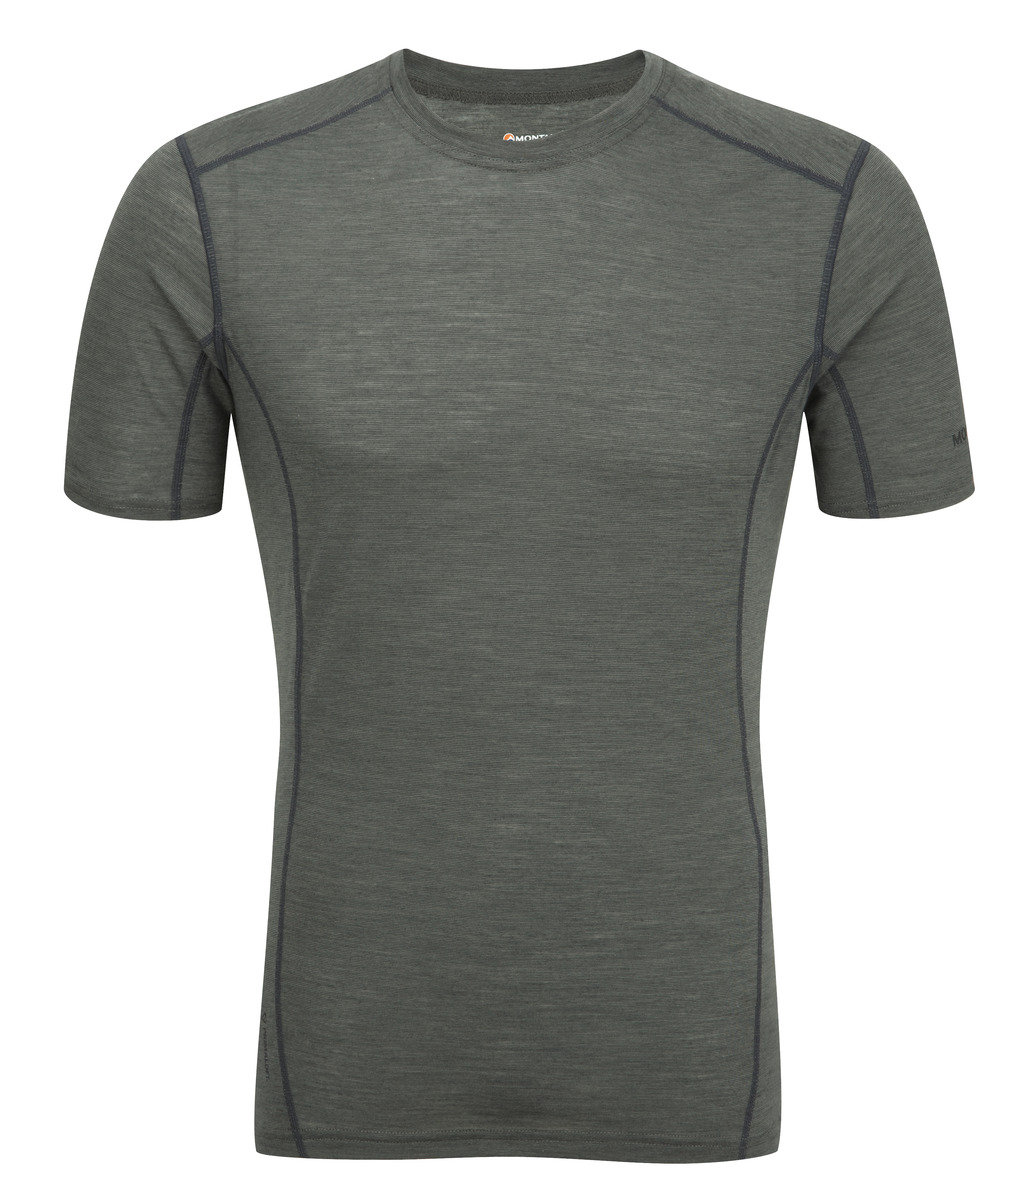 英國男裝 Primino® 短袖保暖內衣 - PRIMINO 140 CREW NECK-SHADOW-L